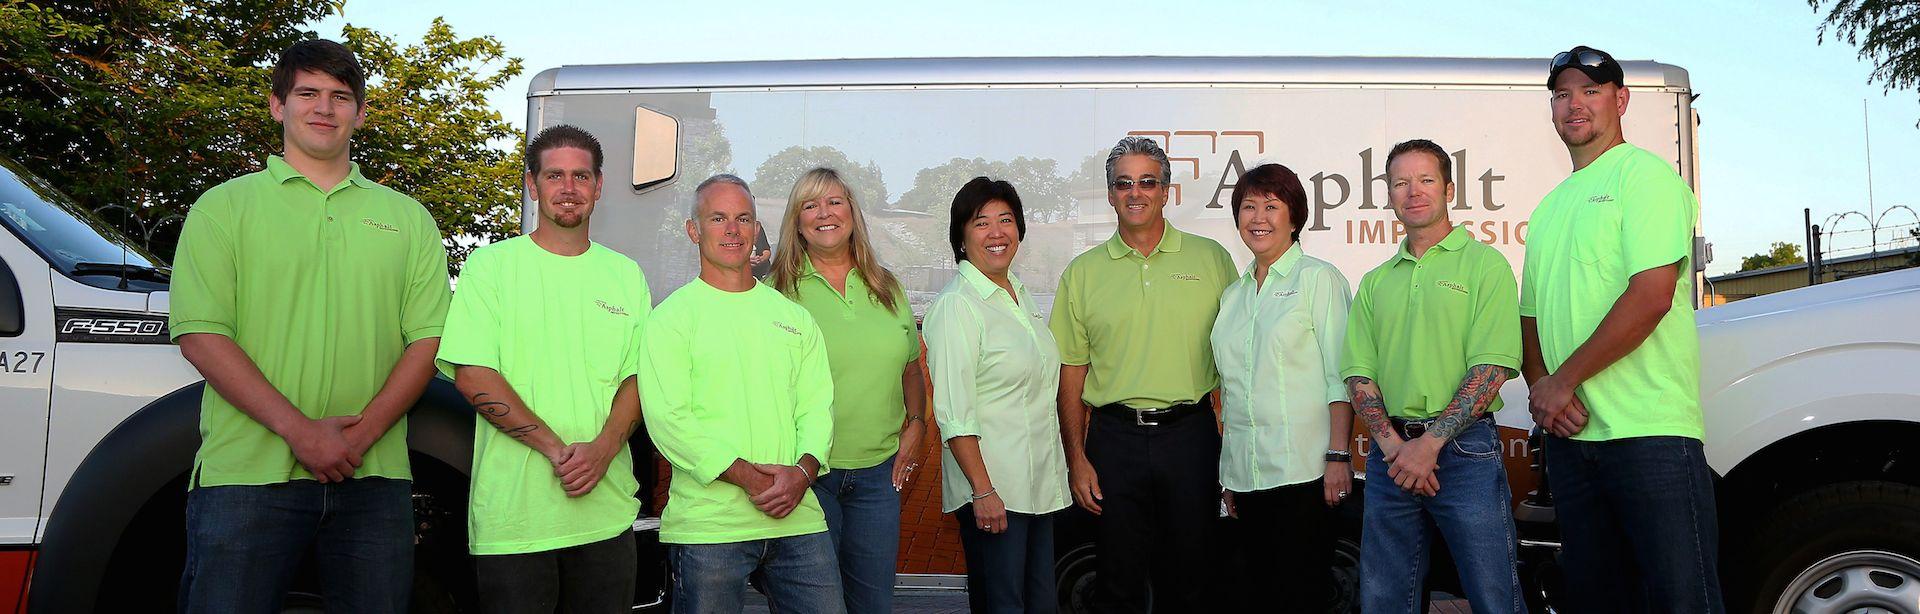 Asphalt Impressions Team